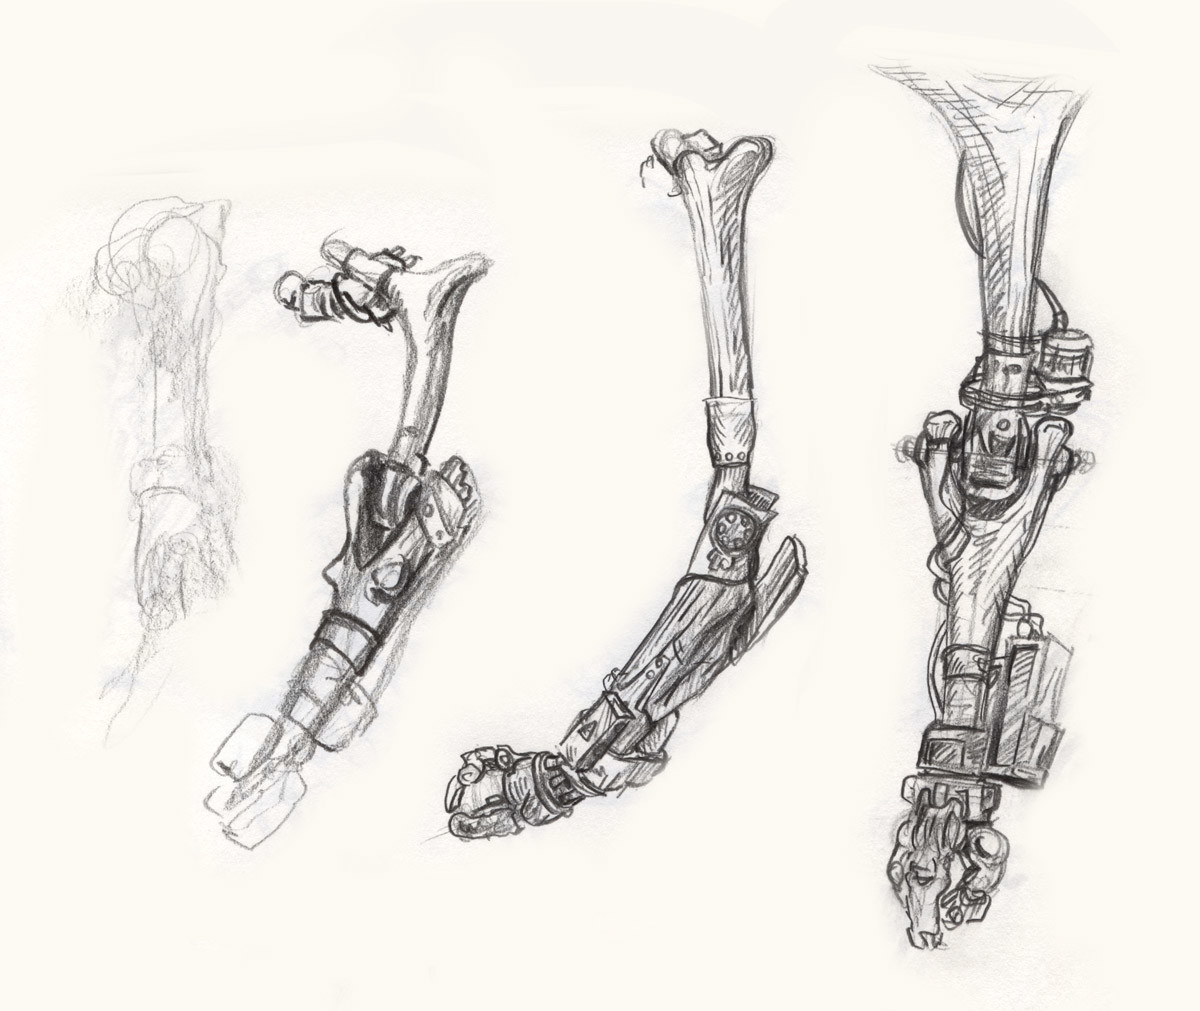 Artificial bone arm sketches